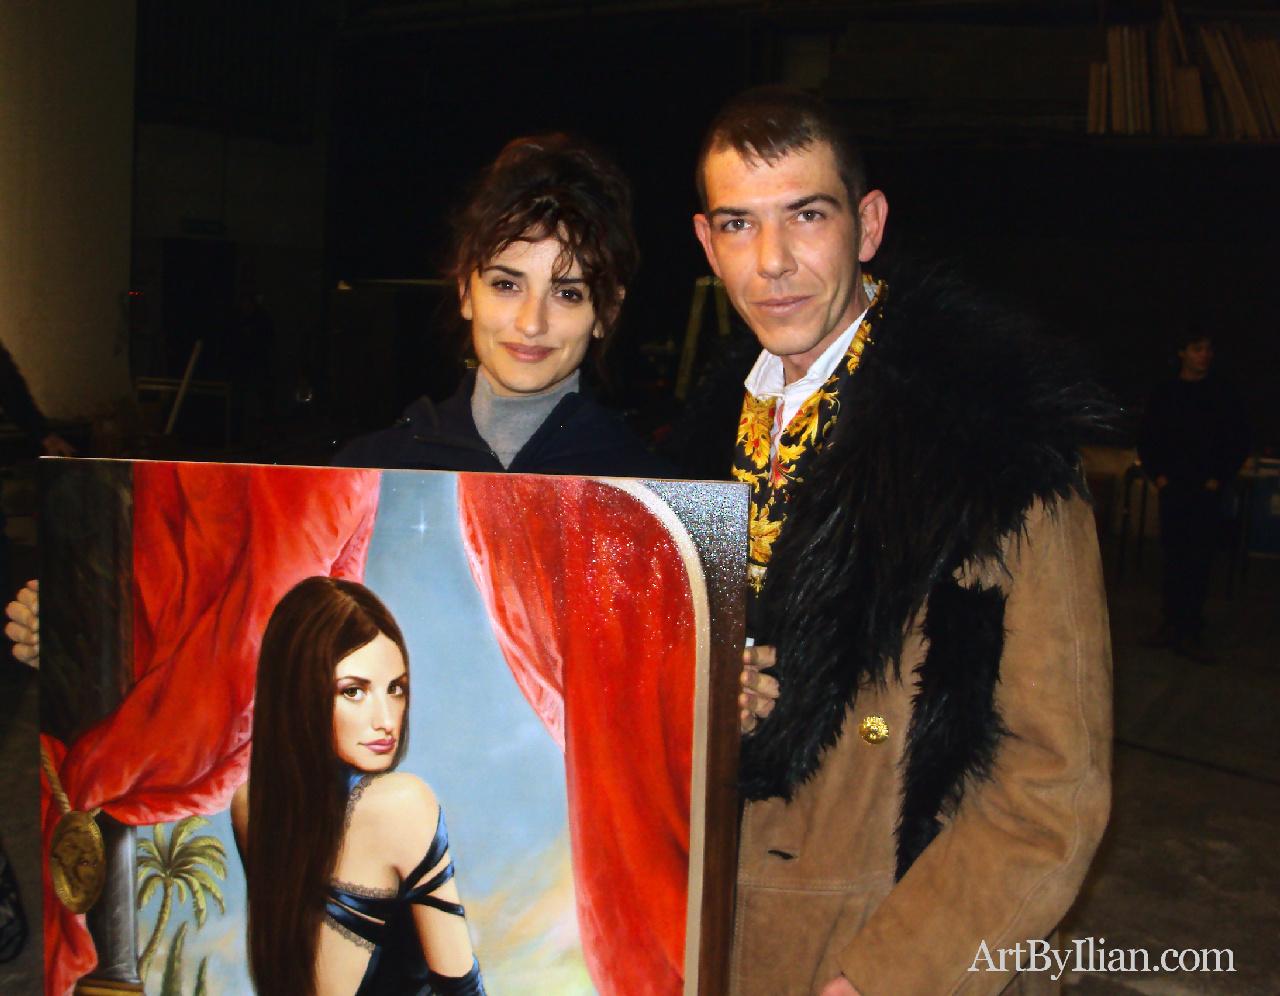 The artist Ilian Rachov and Penelope Cruz